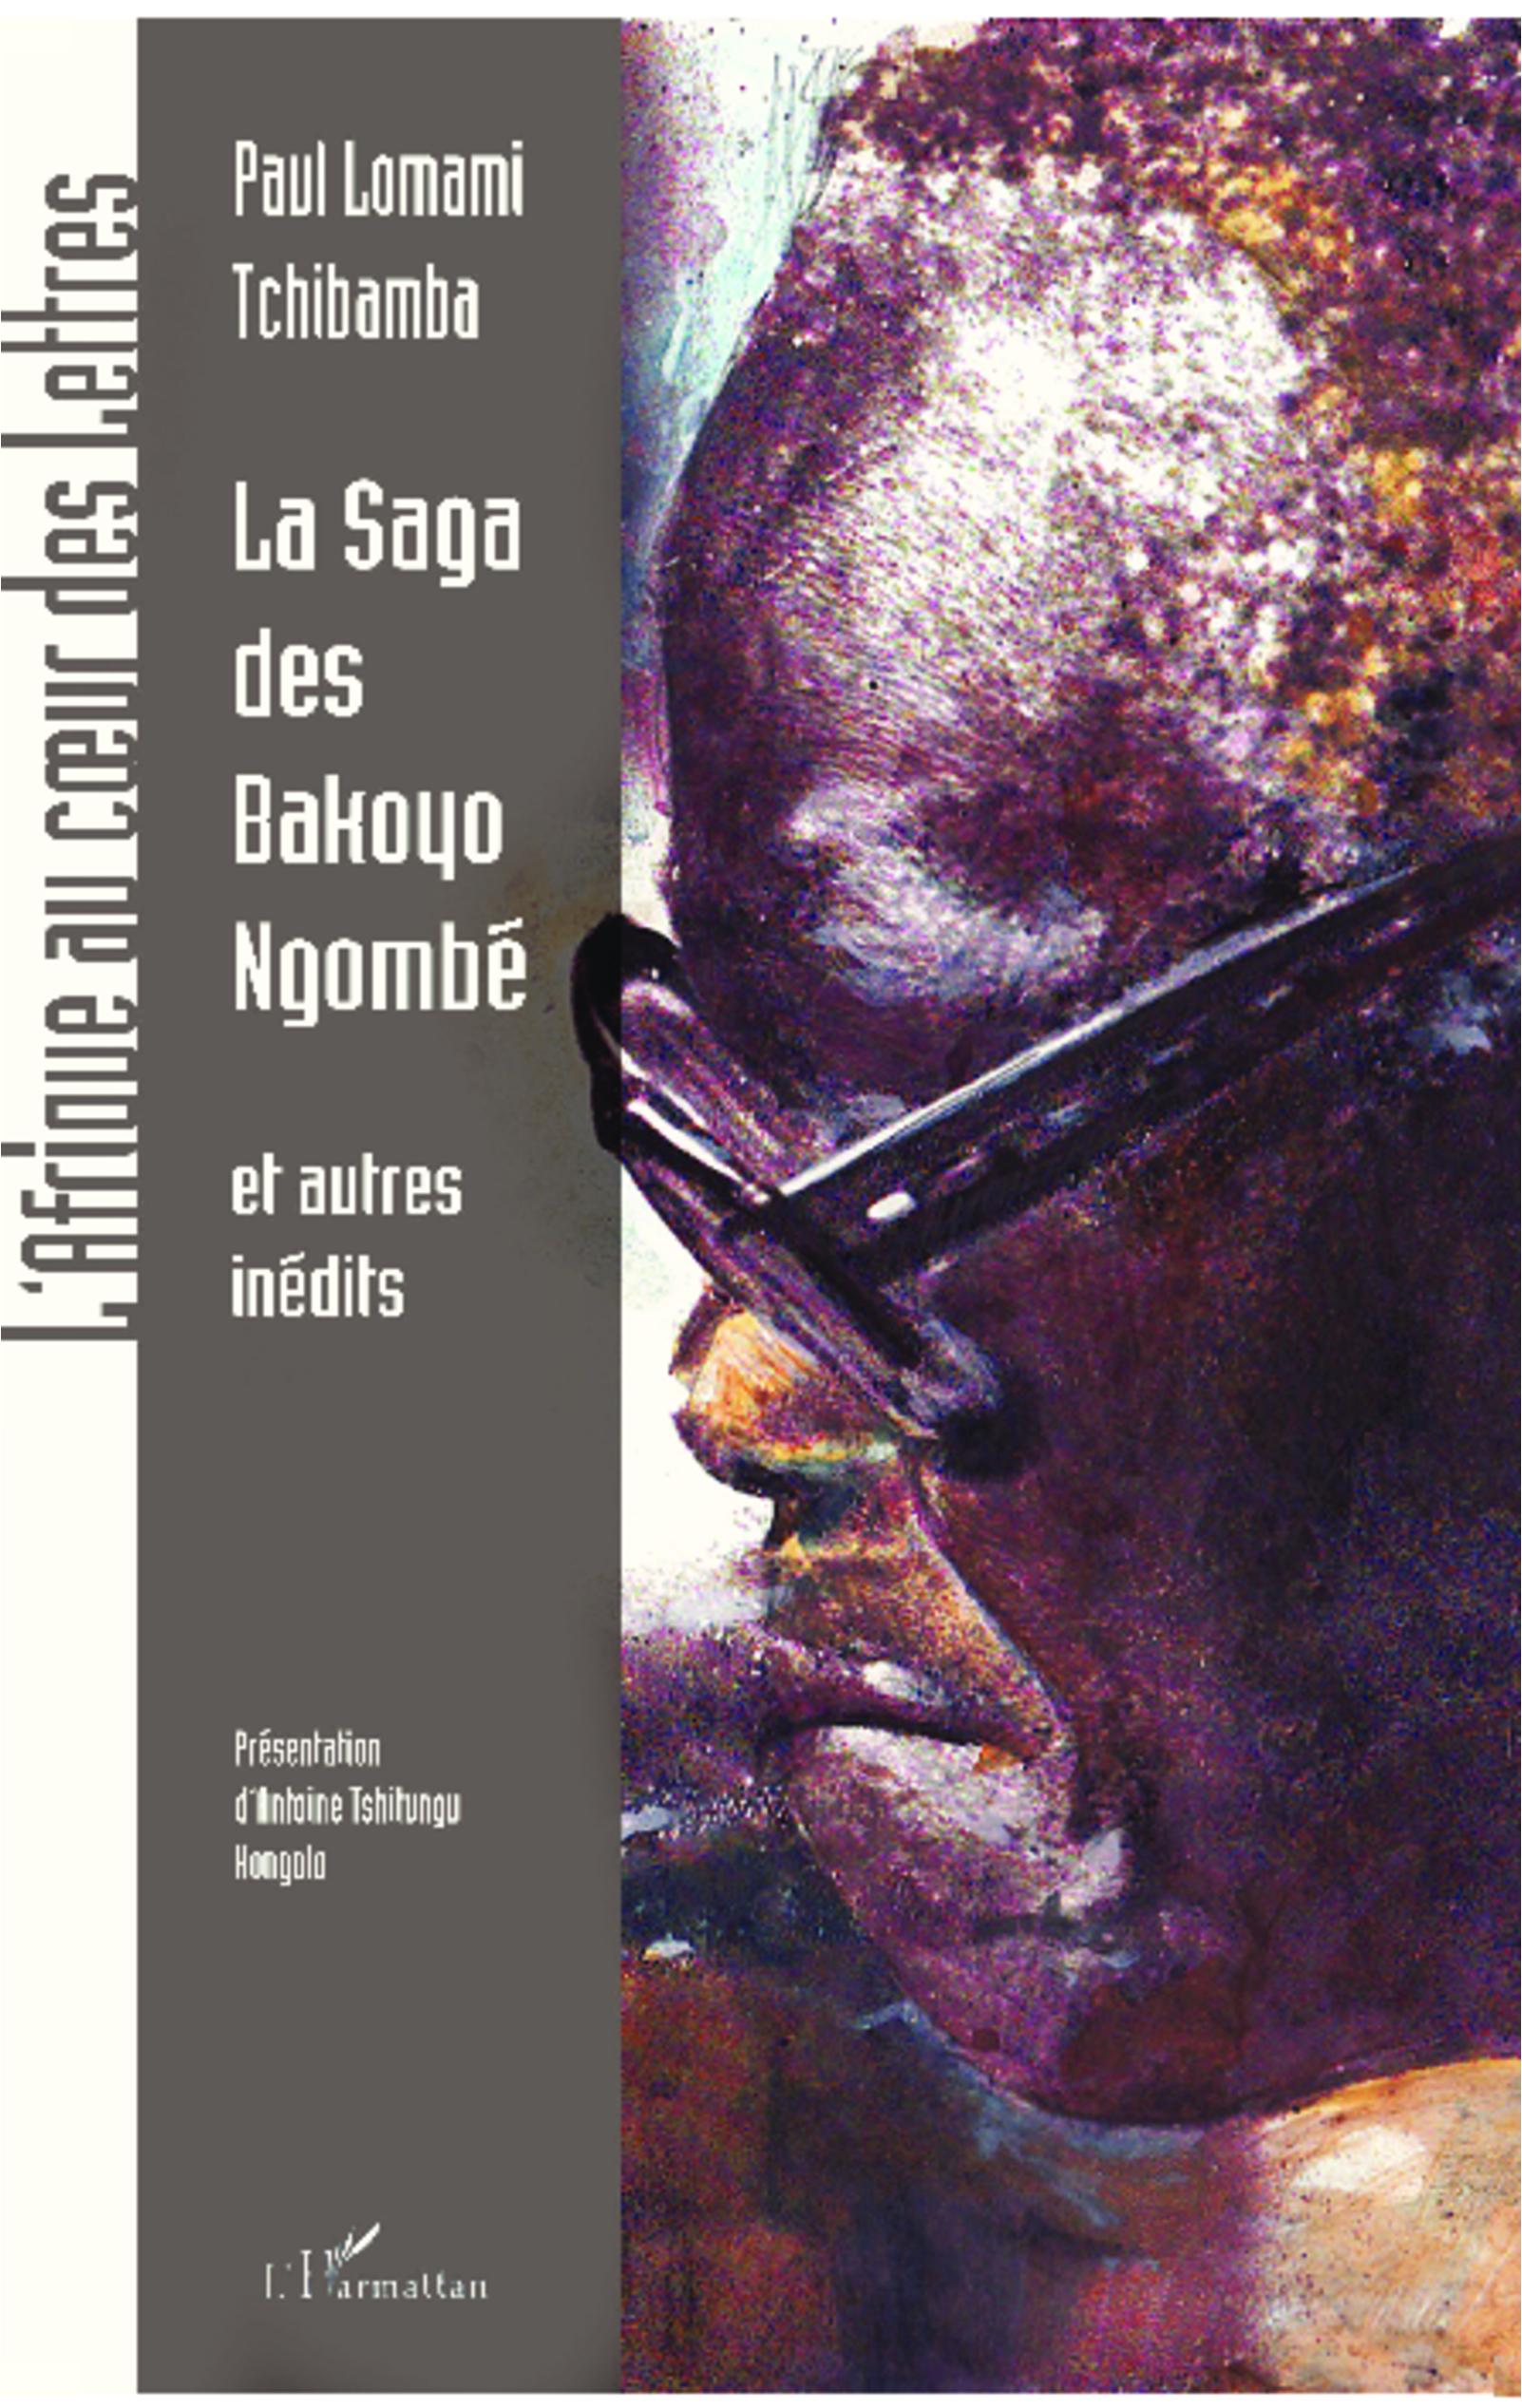 P. Lomami Tchibamba, La Saga des Bakoyo NGombé et autres récit (A. Tshitungu Kongolo, éd.)